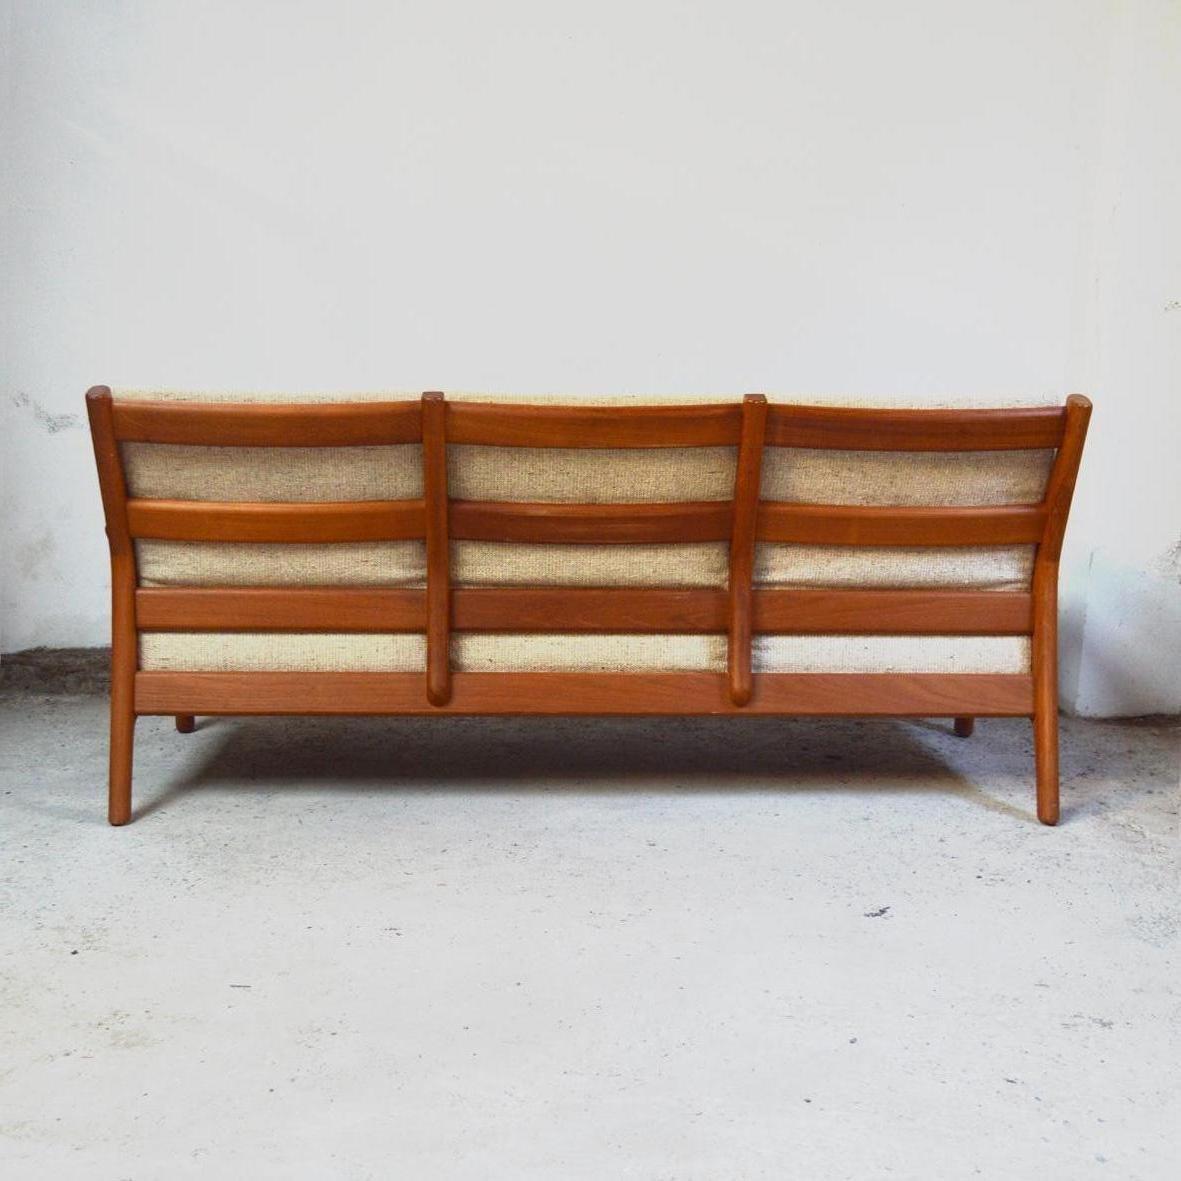 3 sitzer sofa 1960er bei pamono kaufen for Sofa york 3 sitzer